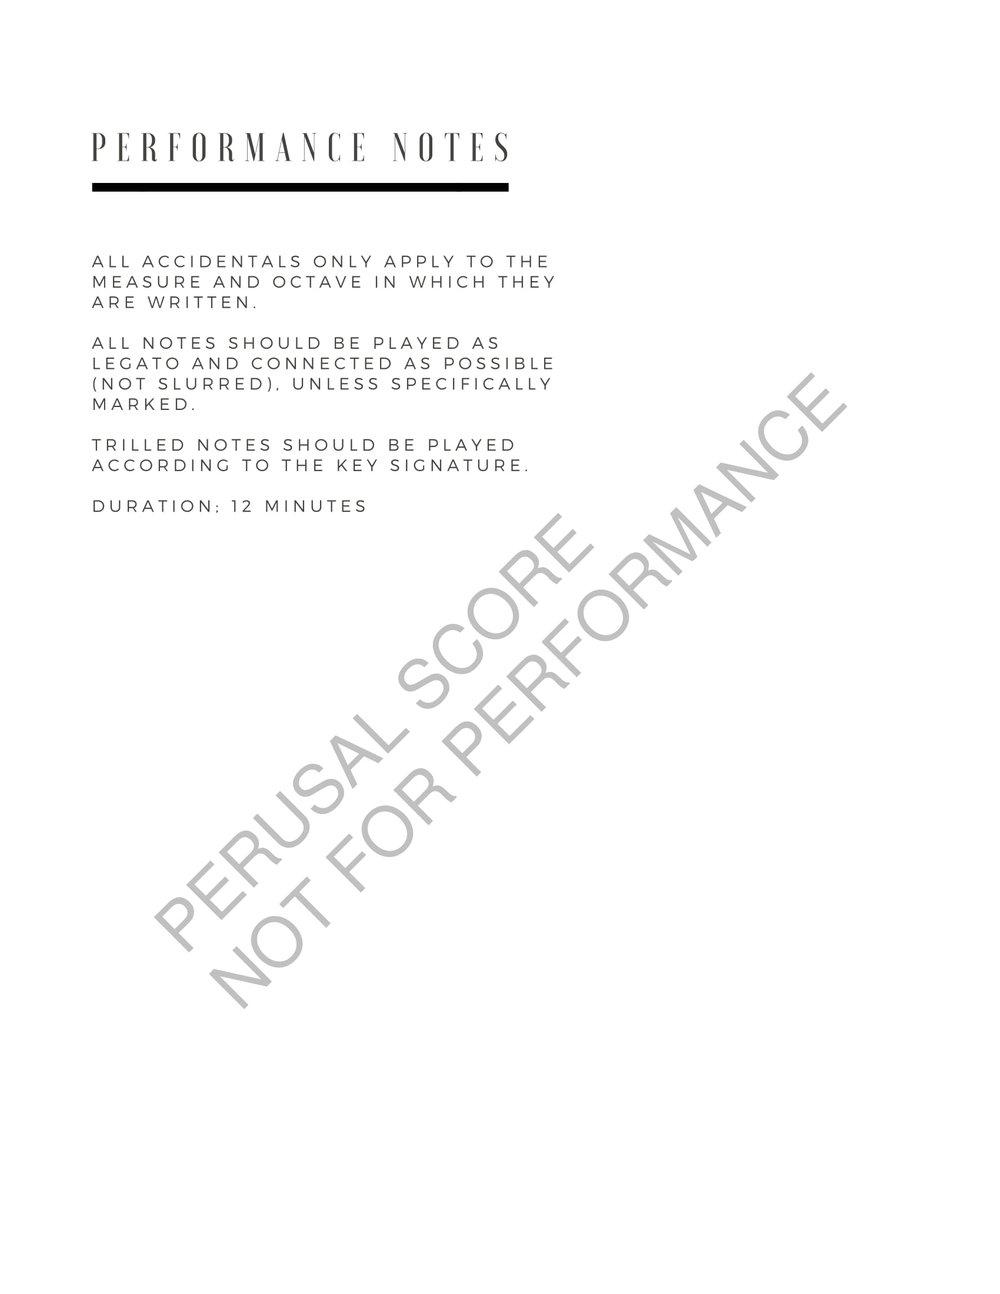 Boyd Terra Liberi Score-watermark-05.jpg